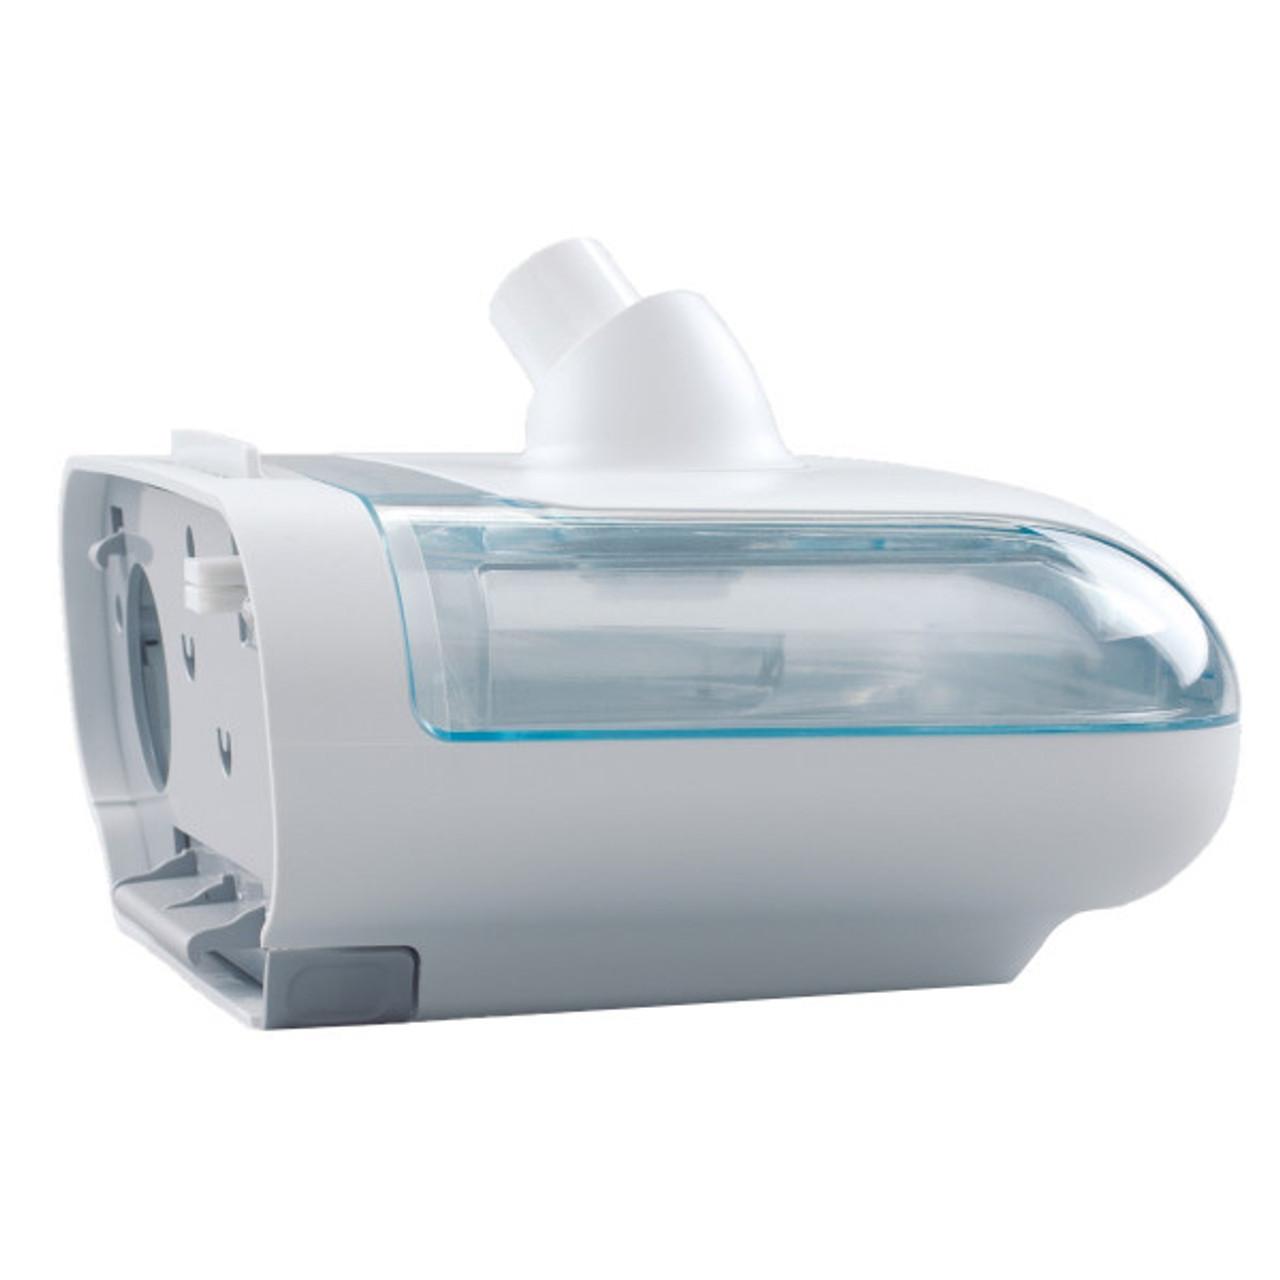 Buy Philips Respironics DreamStation Humidifier Online in Australia